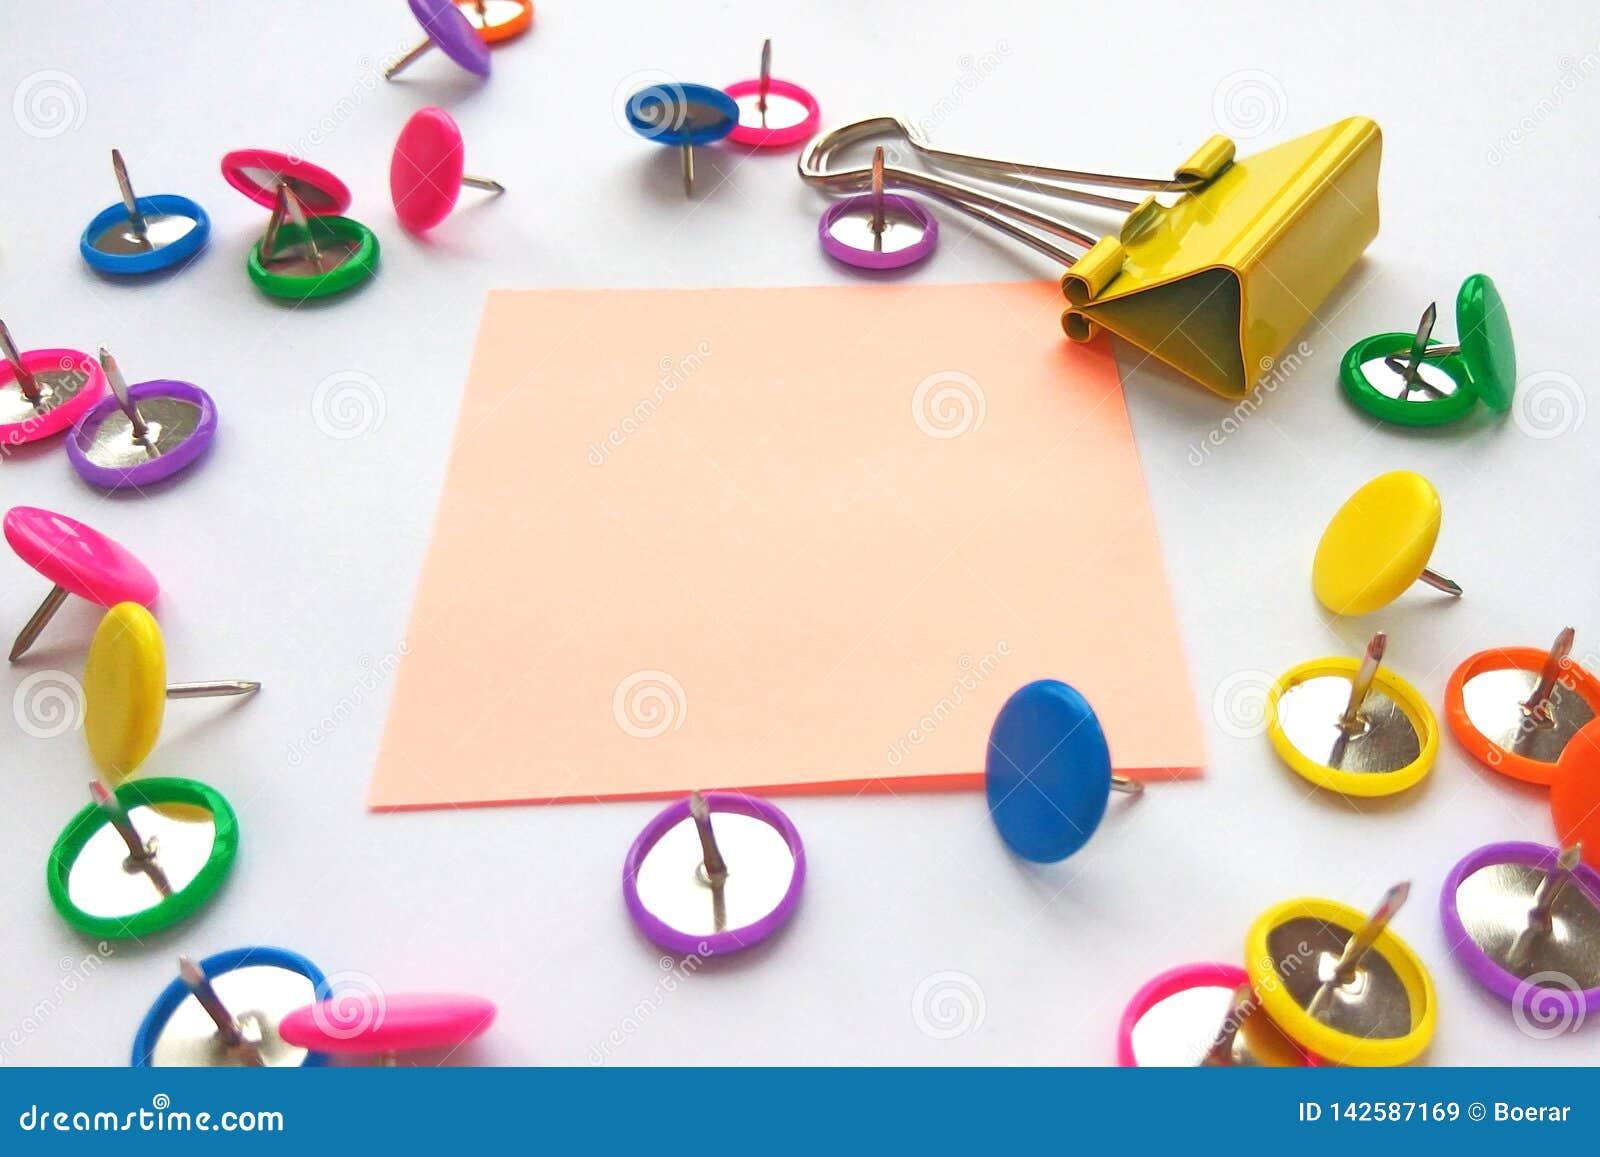 Clipes de papel da escola e dos materiais de escrit?rio, pinos, notas, etiquetas no fundo branco Zombaria acima